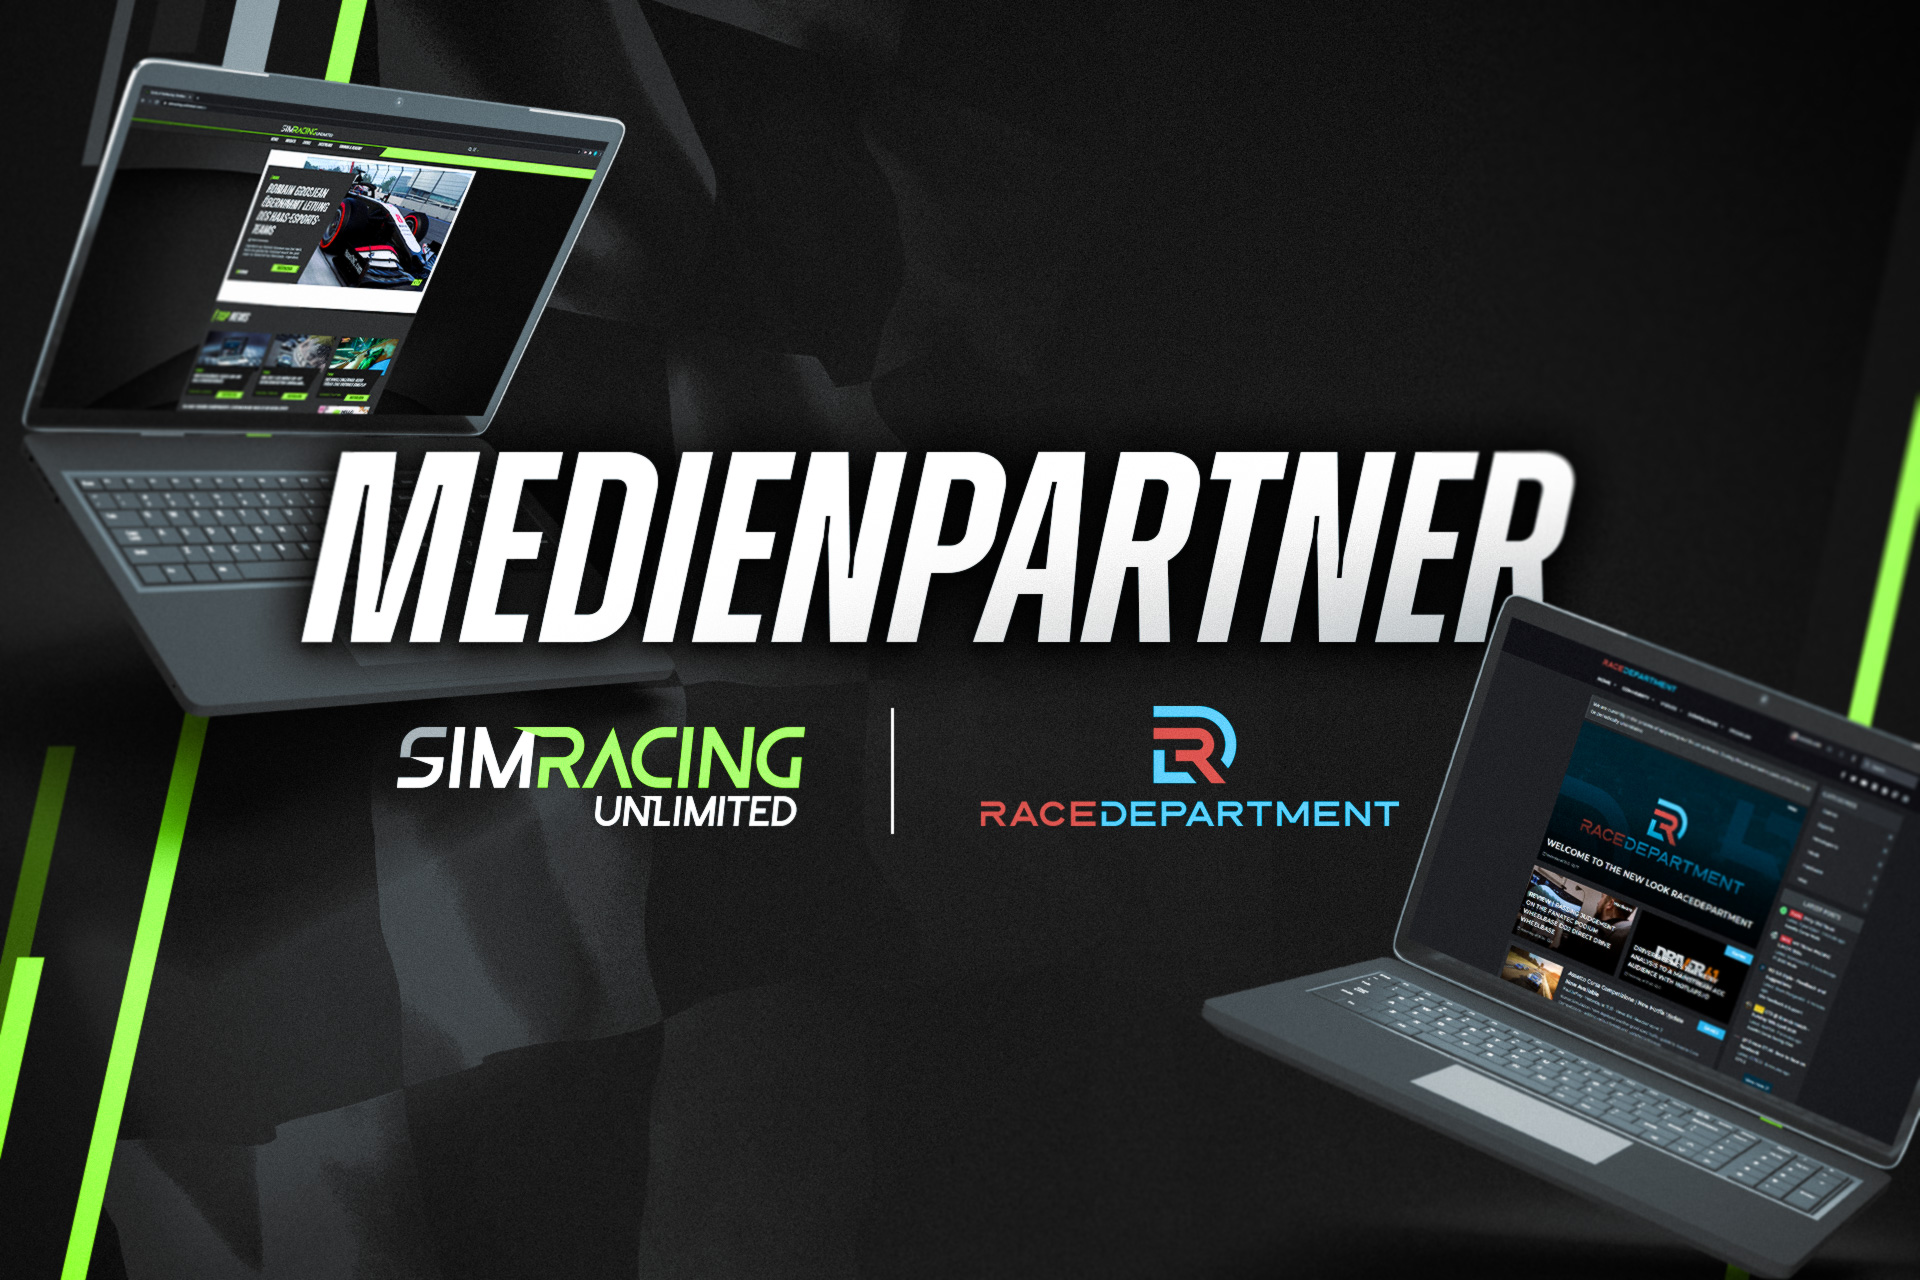 RaceDepartment & SimRacing Unlimited offizielle Medienpartner 2021